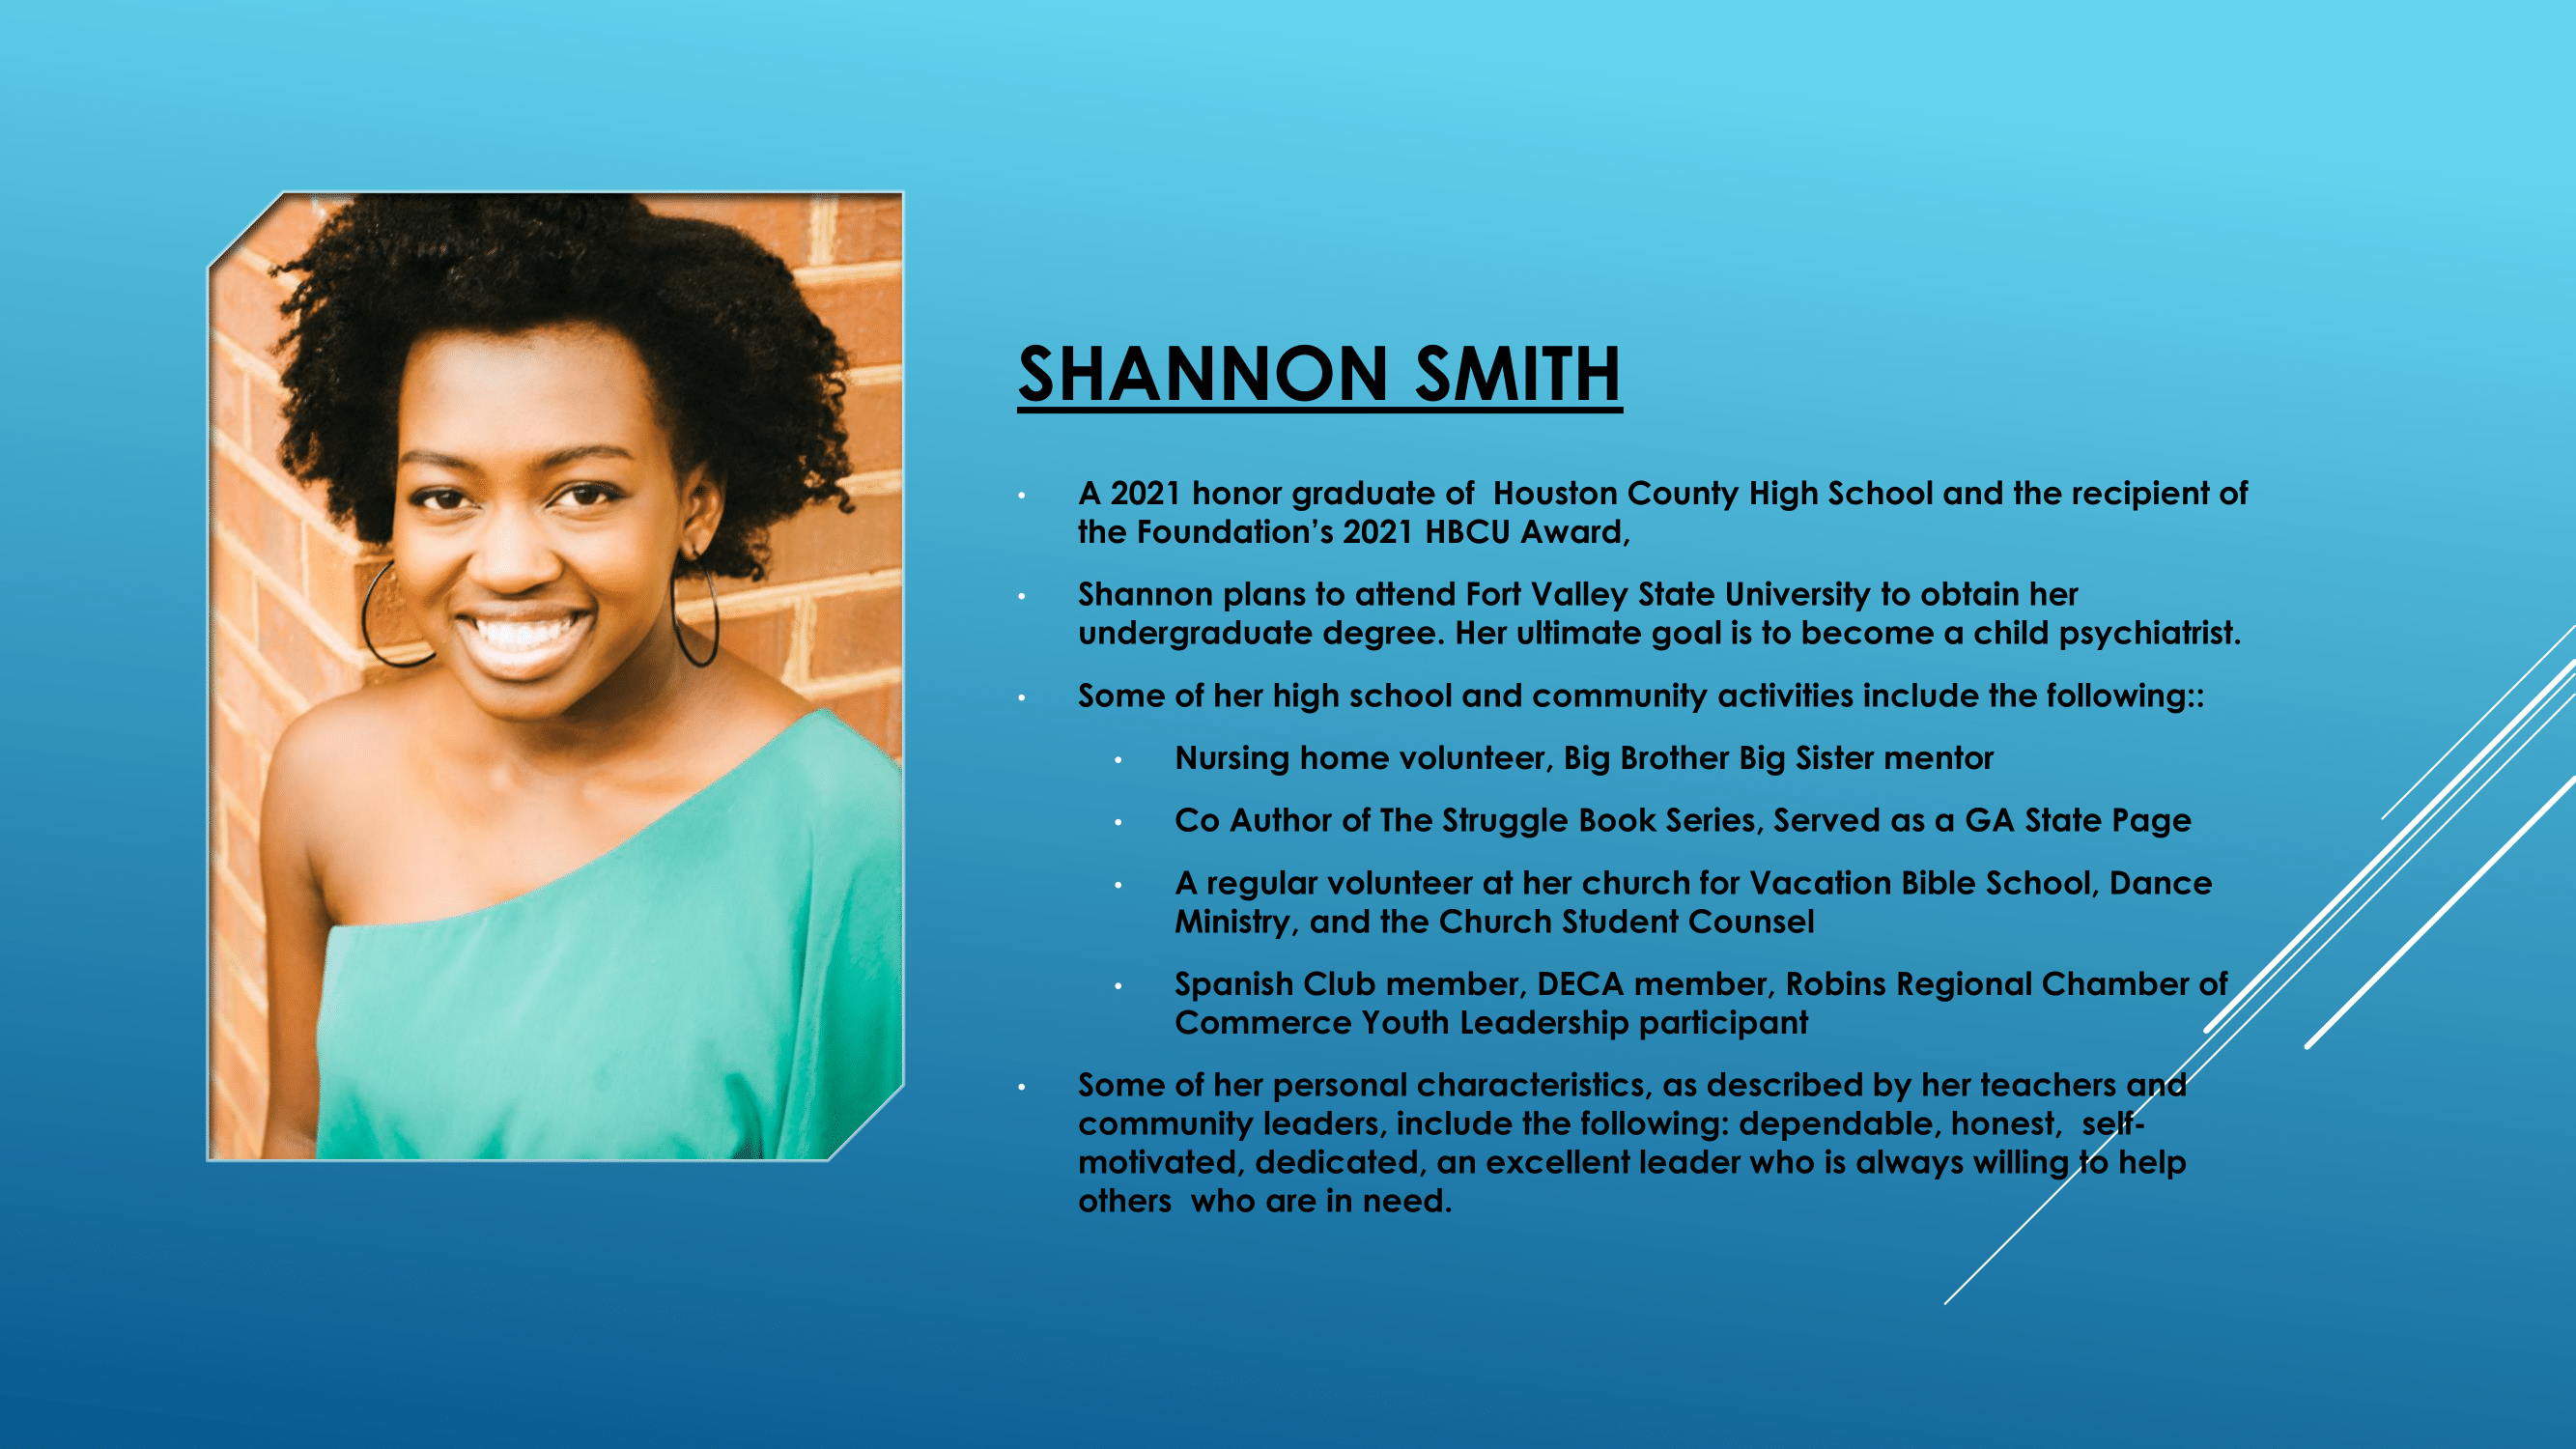 Nece Hopson Memorial Foundation  (NHMF) scholarship 2021 Recipient Shannon Smith